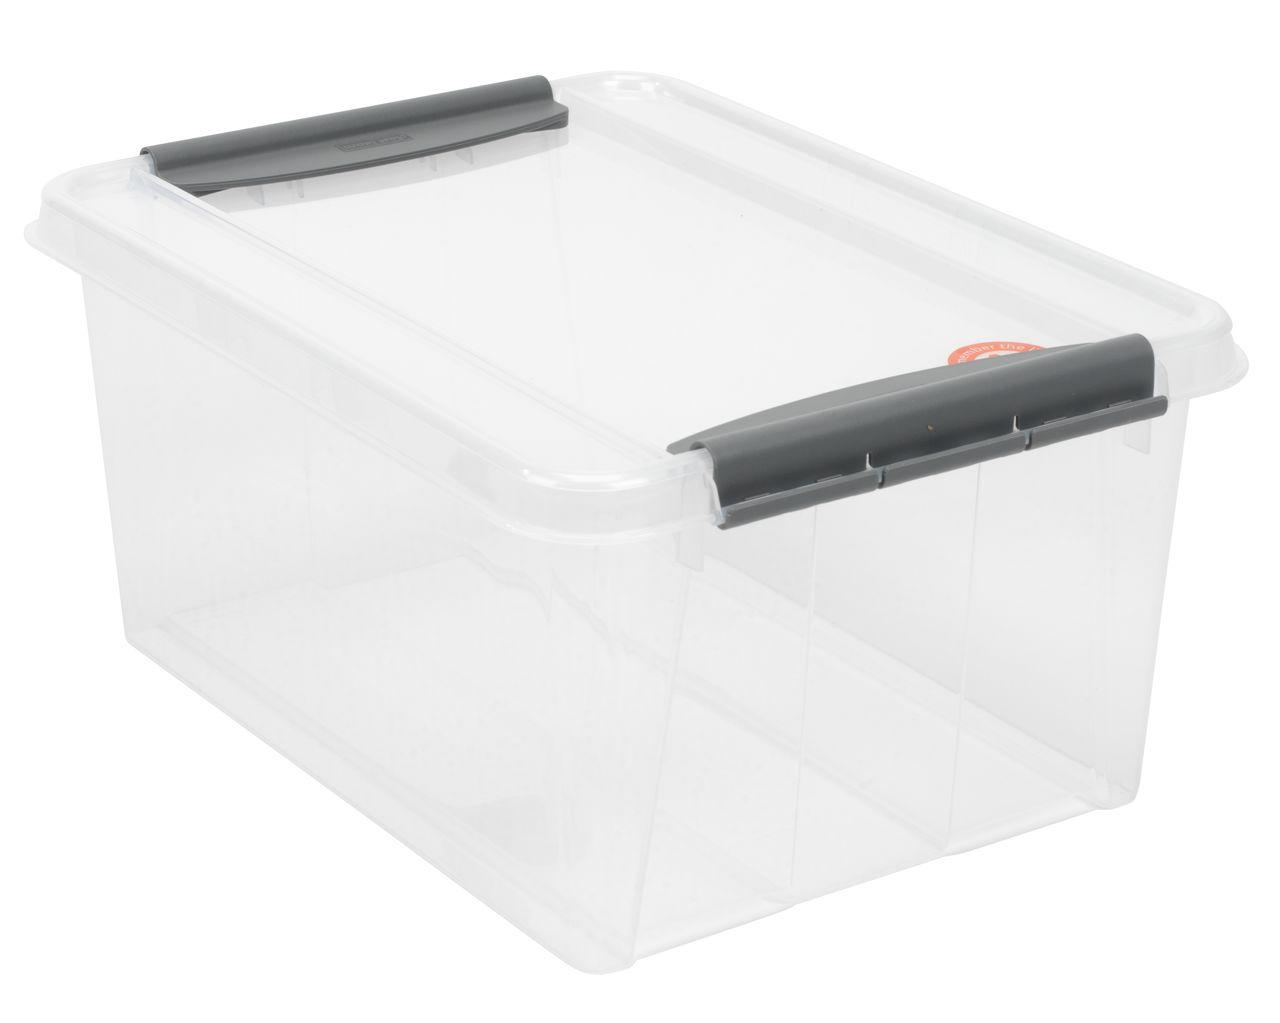 dd30a1f59 Úložný box PROBOX 14L s víkem | JYSK